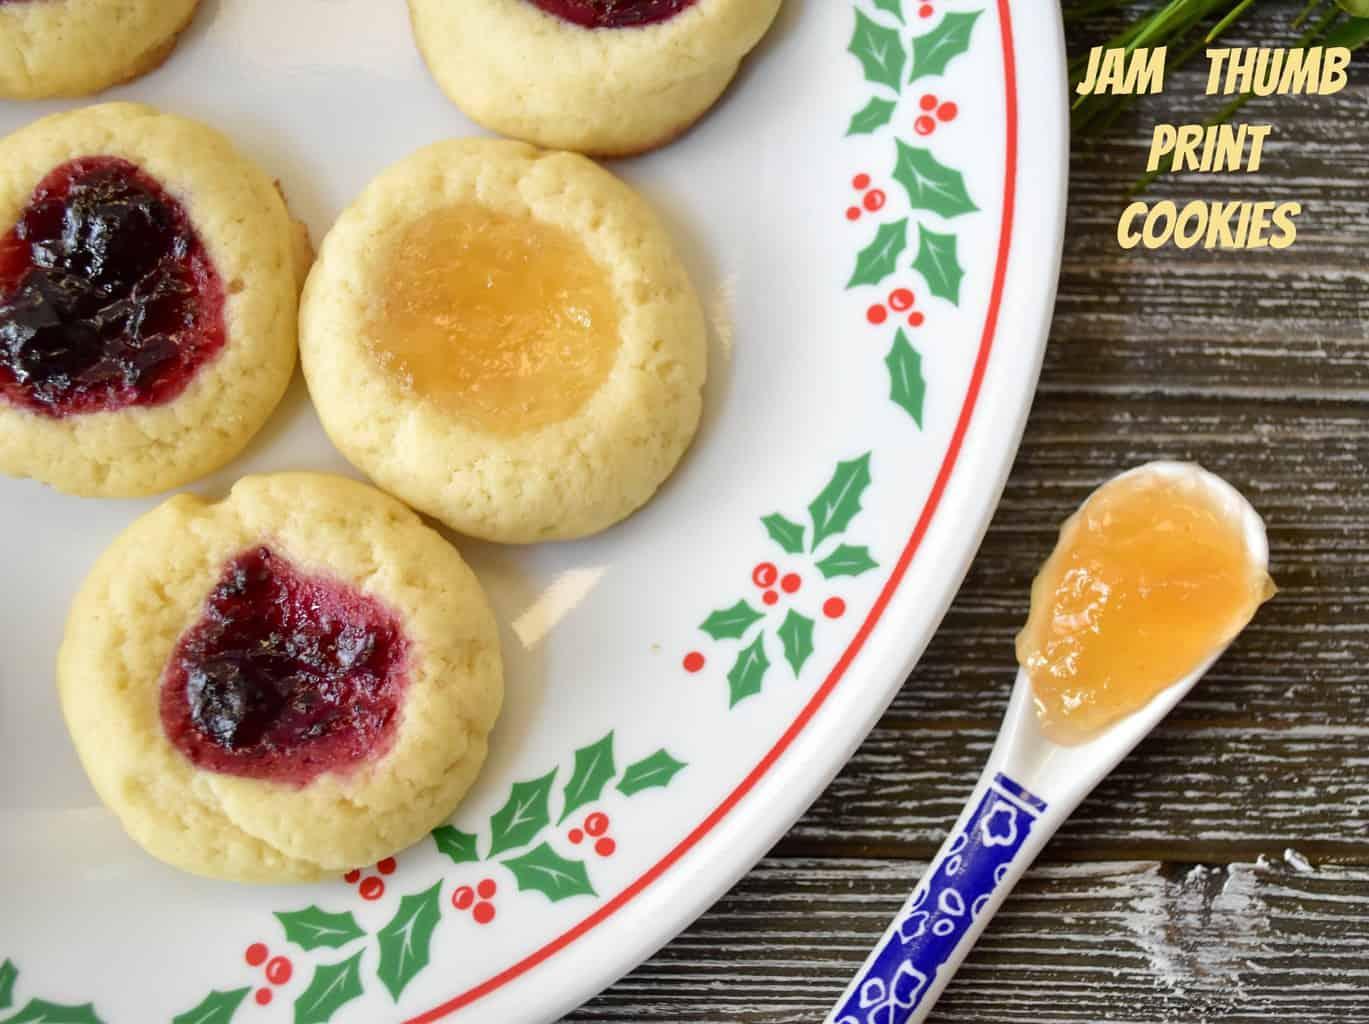 "<img src=""https://cdn.shortpixel.ai/client/q_glossy,ret_img,w_3651,h_2730/Jam Thumbprint cookies.jpg"" alt=""JamThumb print cookies with jam"">"